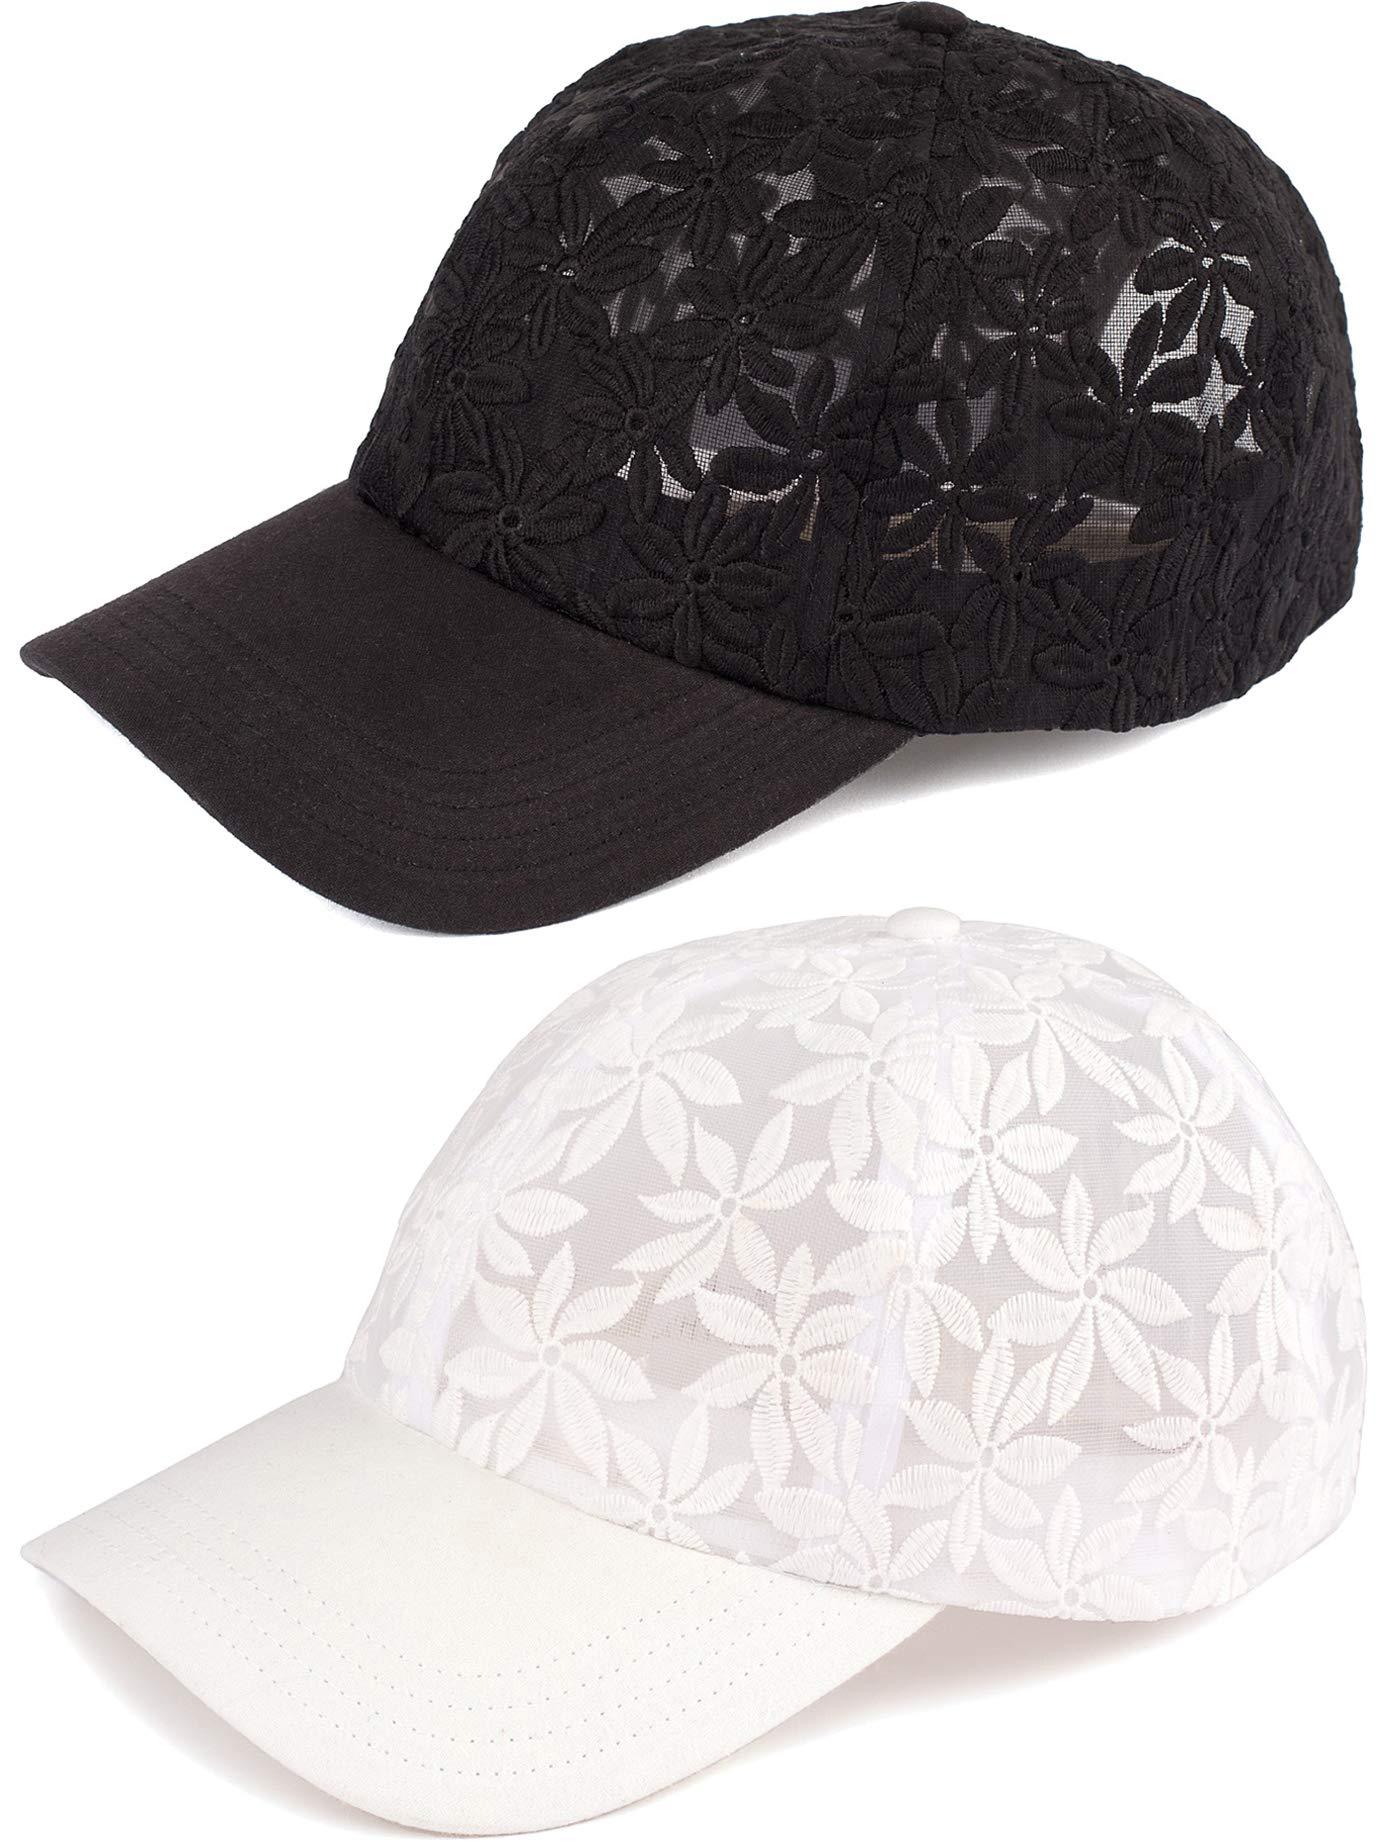 H-6053-2-0609 Floral Cap Bundle: Sheer Daisy Black & White 2 Pack